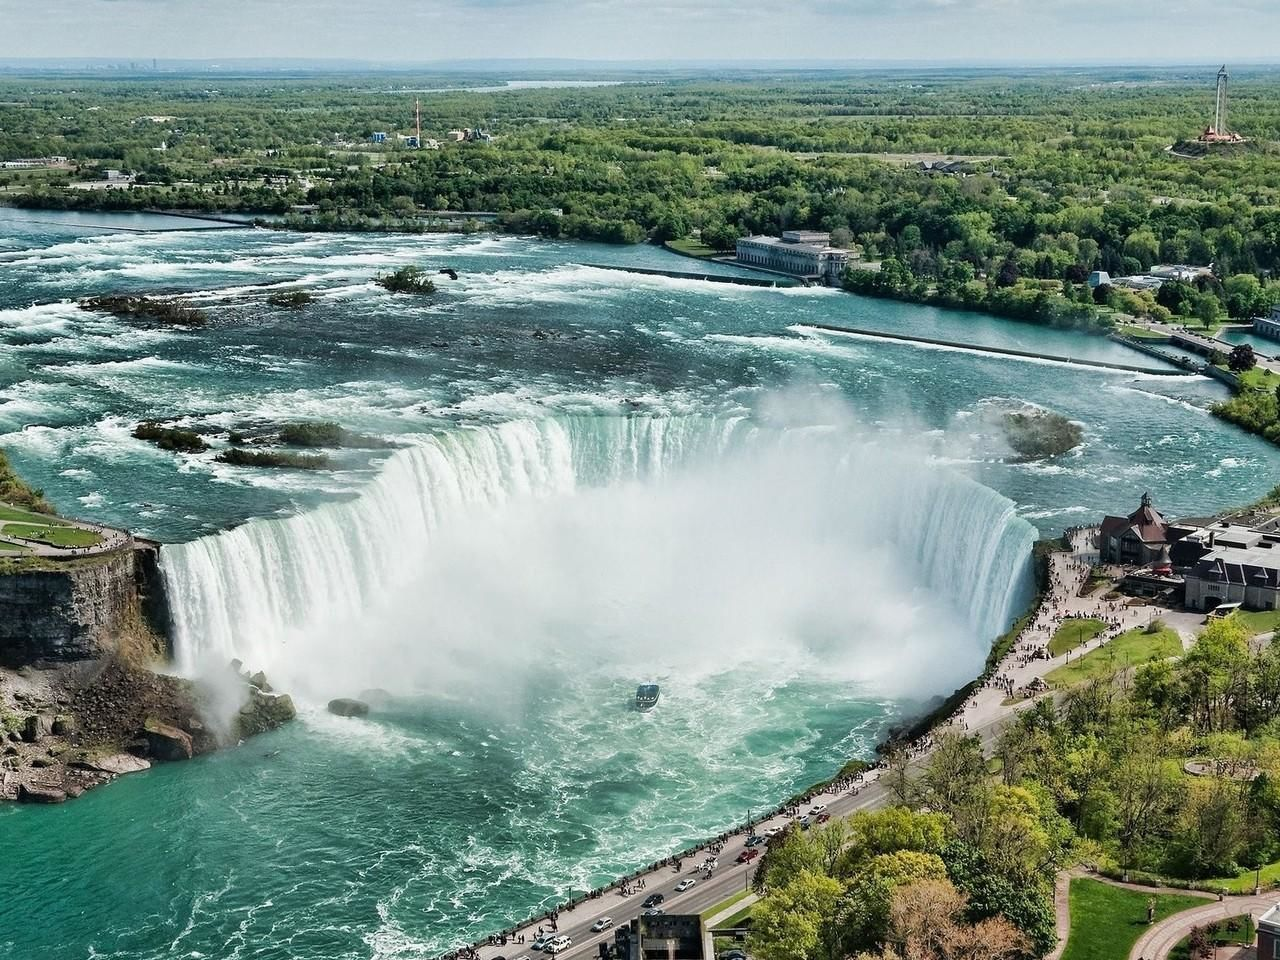 Niagara Falls Day Small Group Tour from Toronto